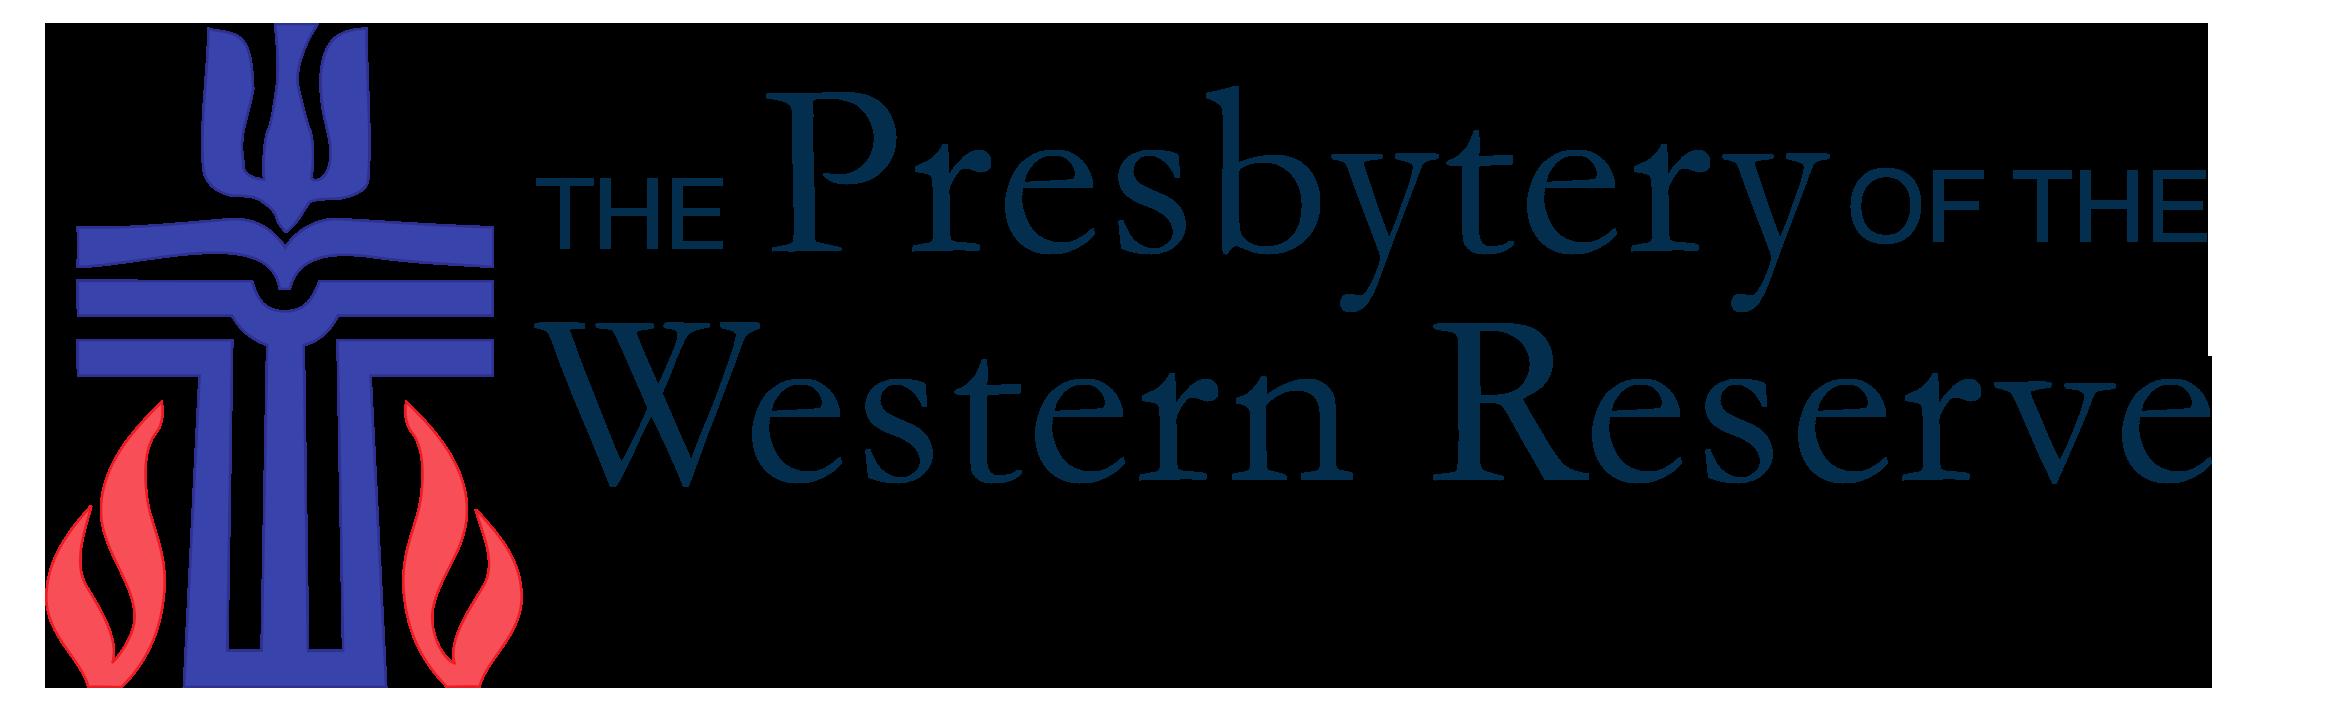 Presbytery of the Western Reserve